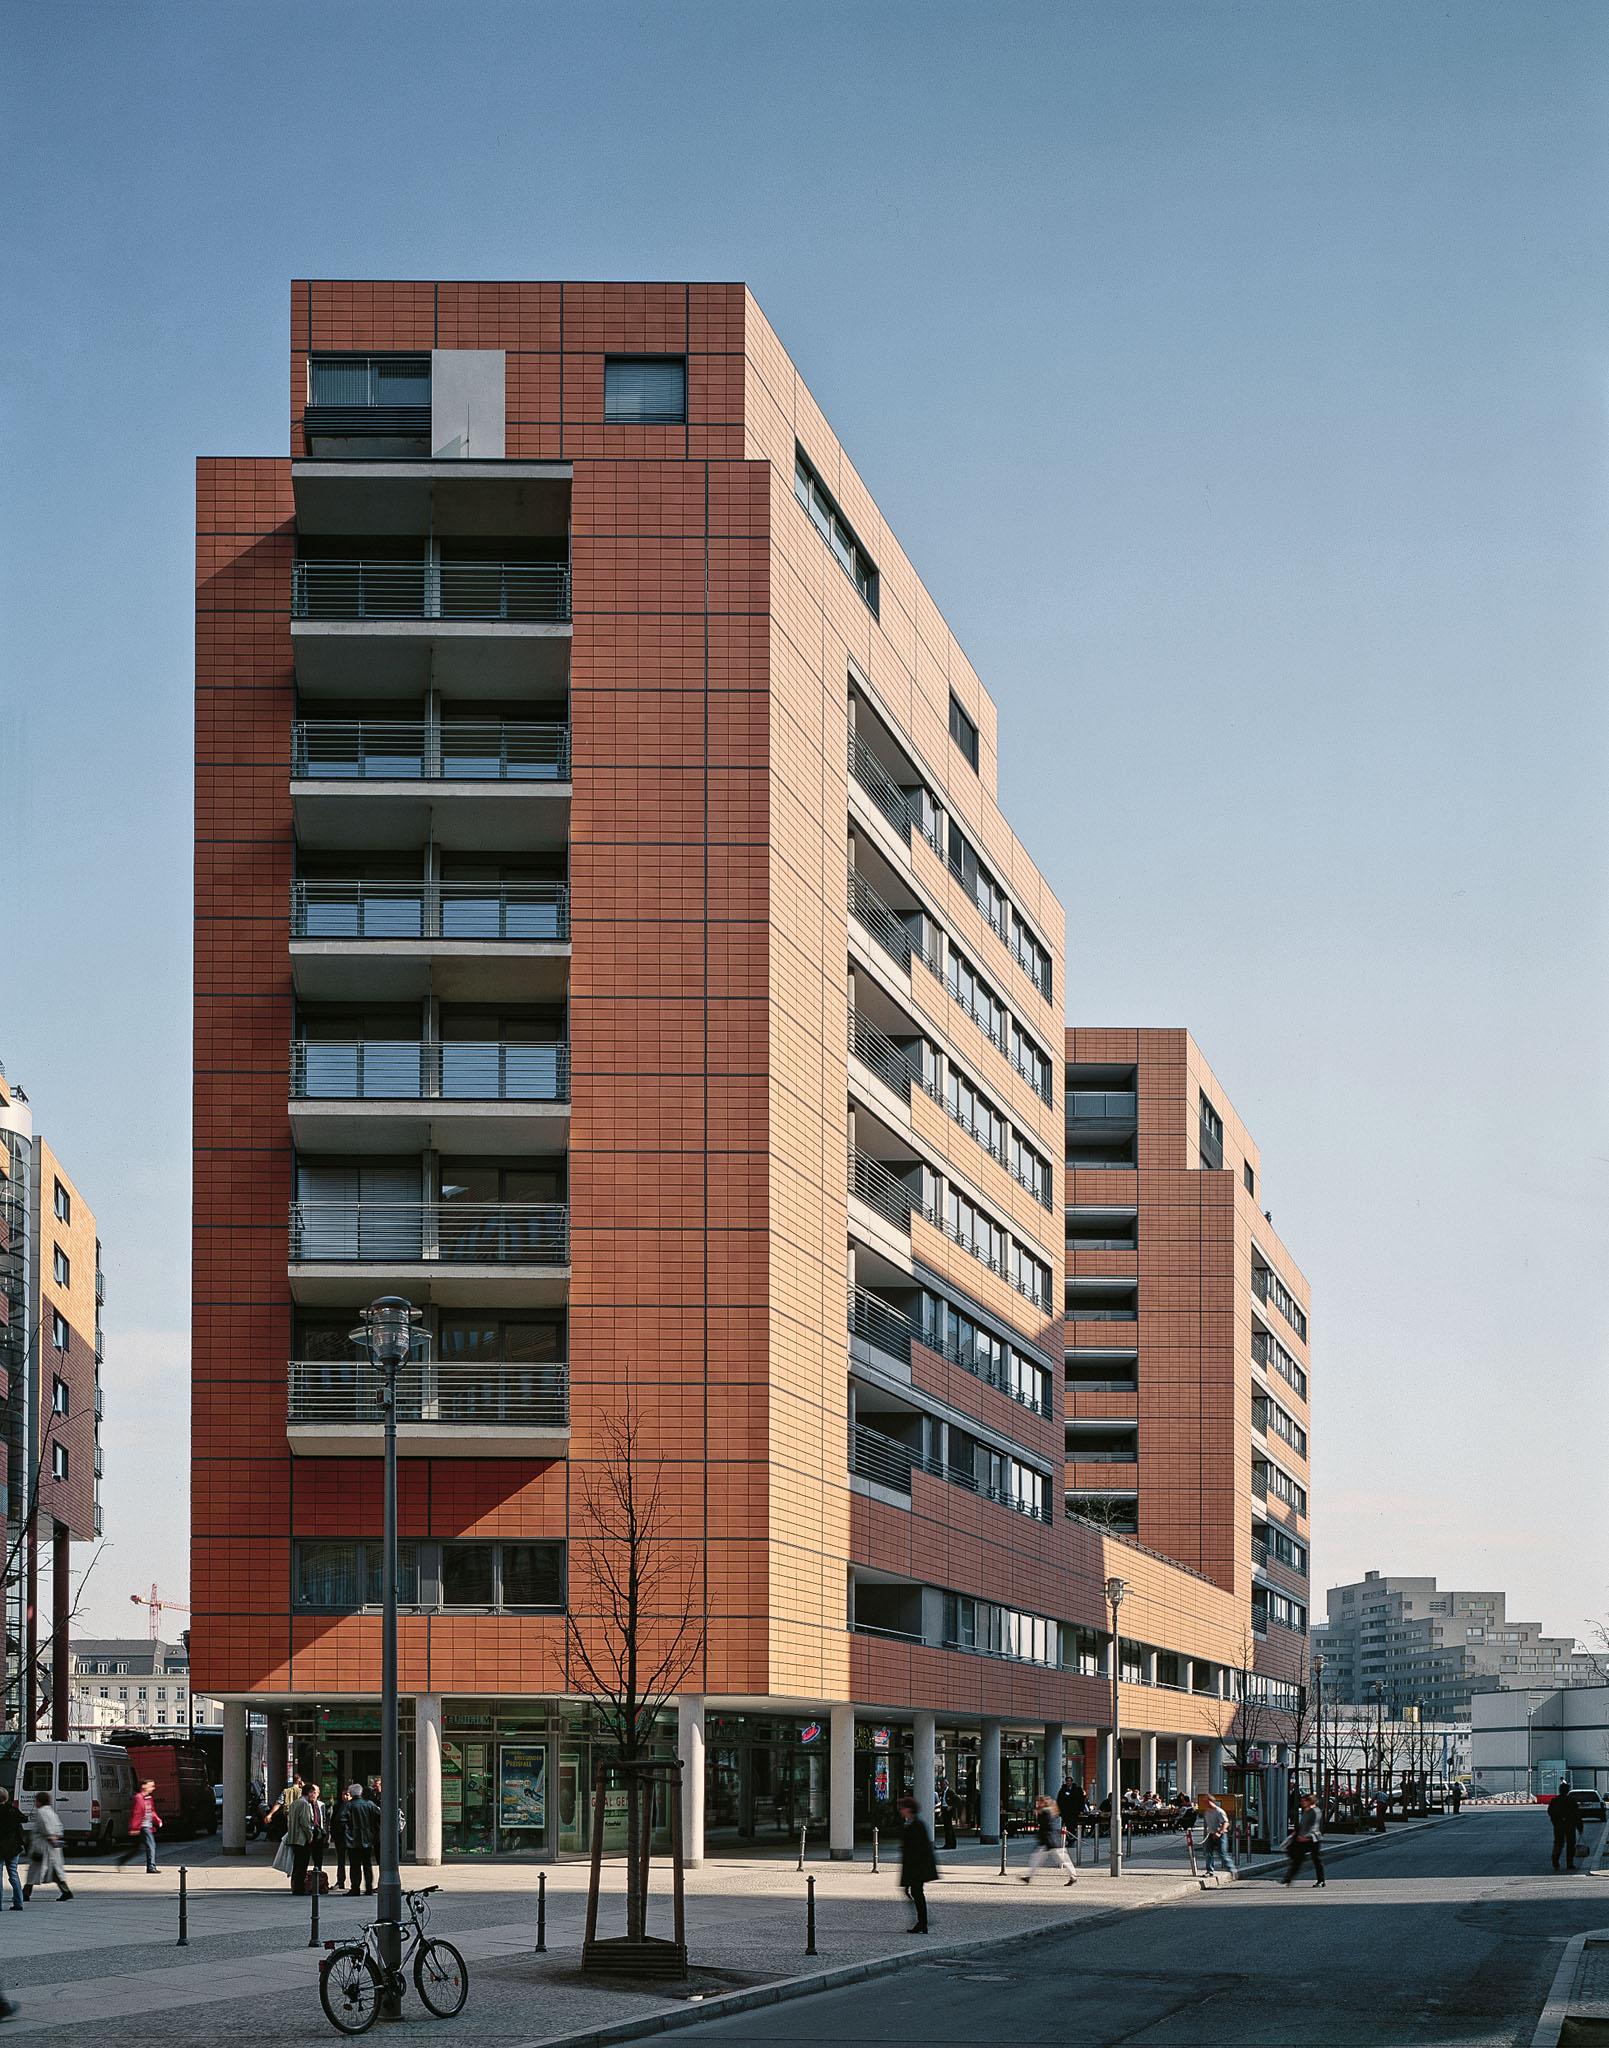 B9 Potsdamer Platz 4